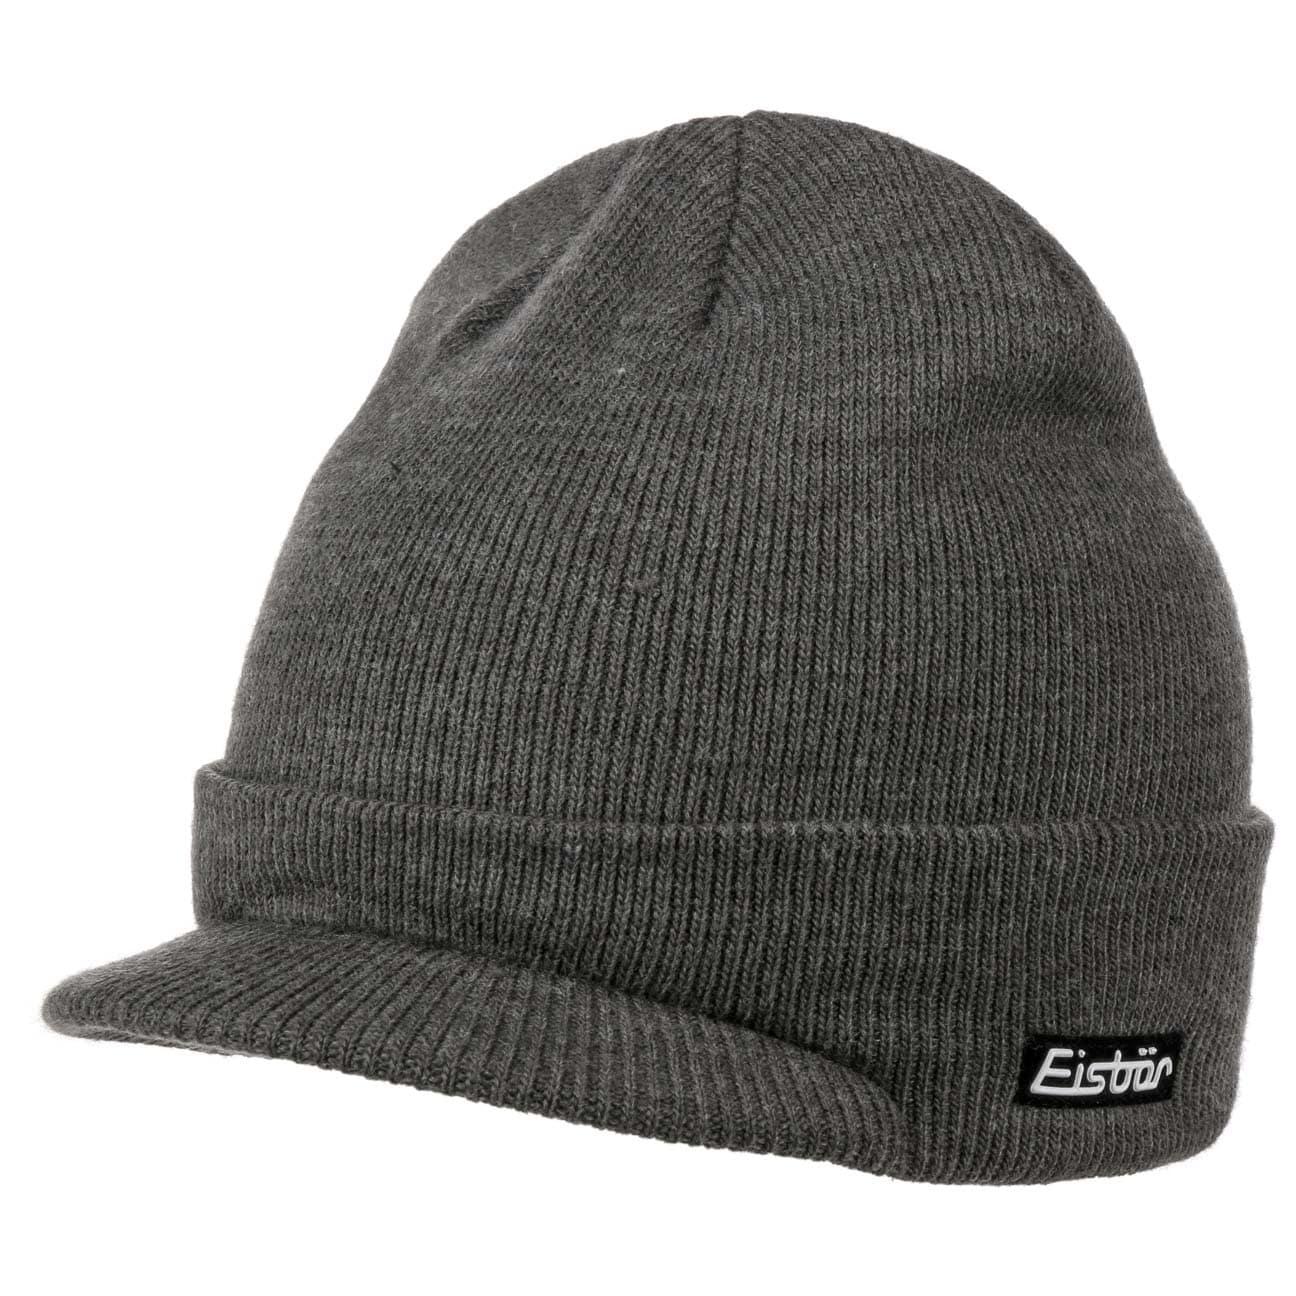 Bonnet Otto by Eisbär  beanie